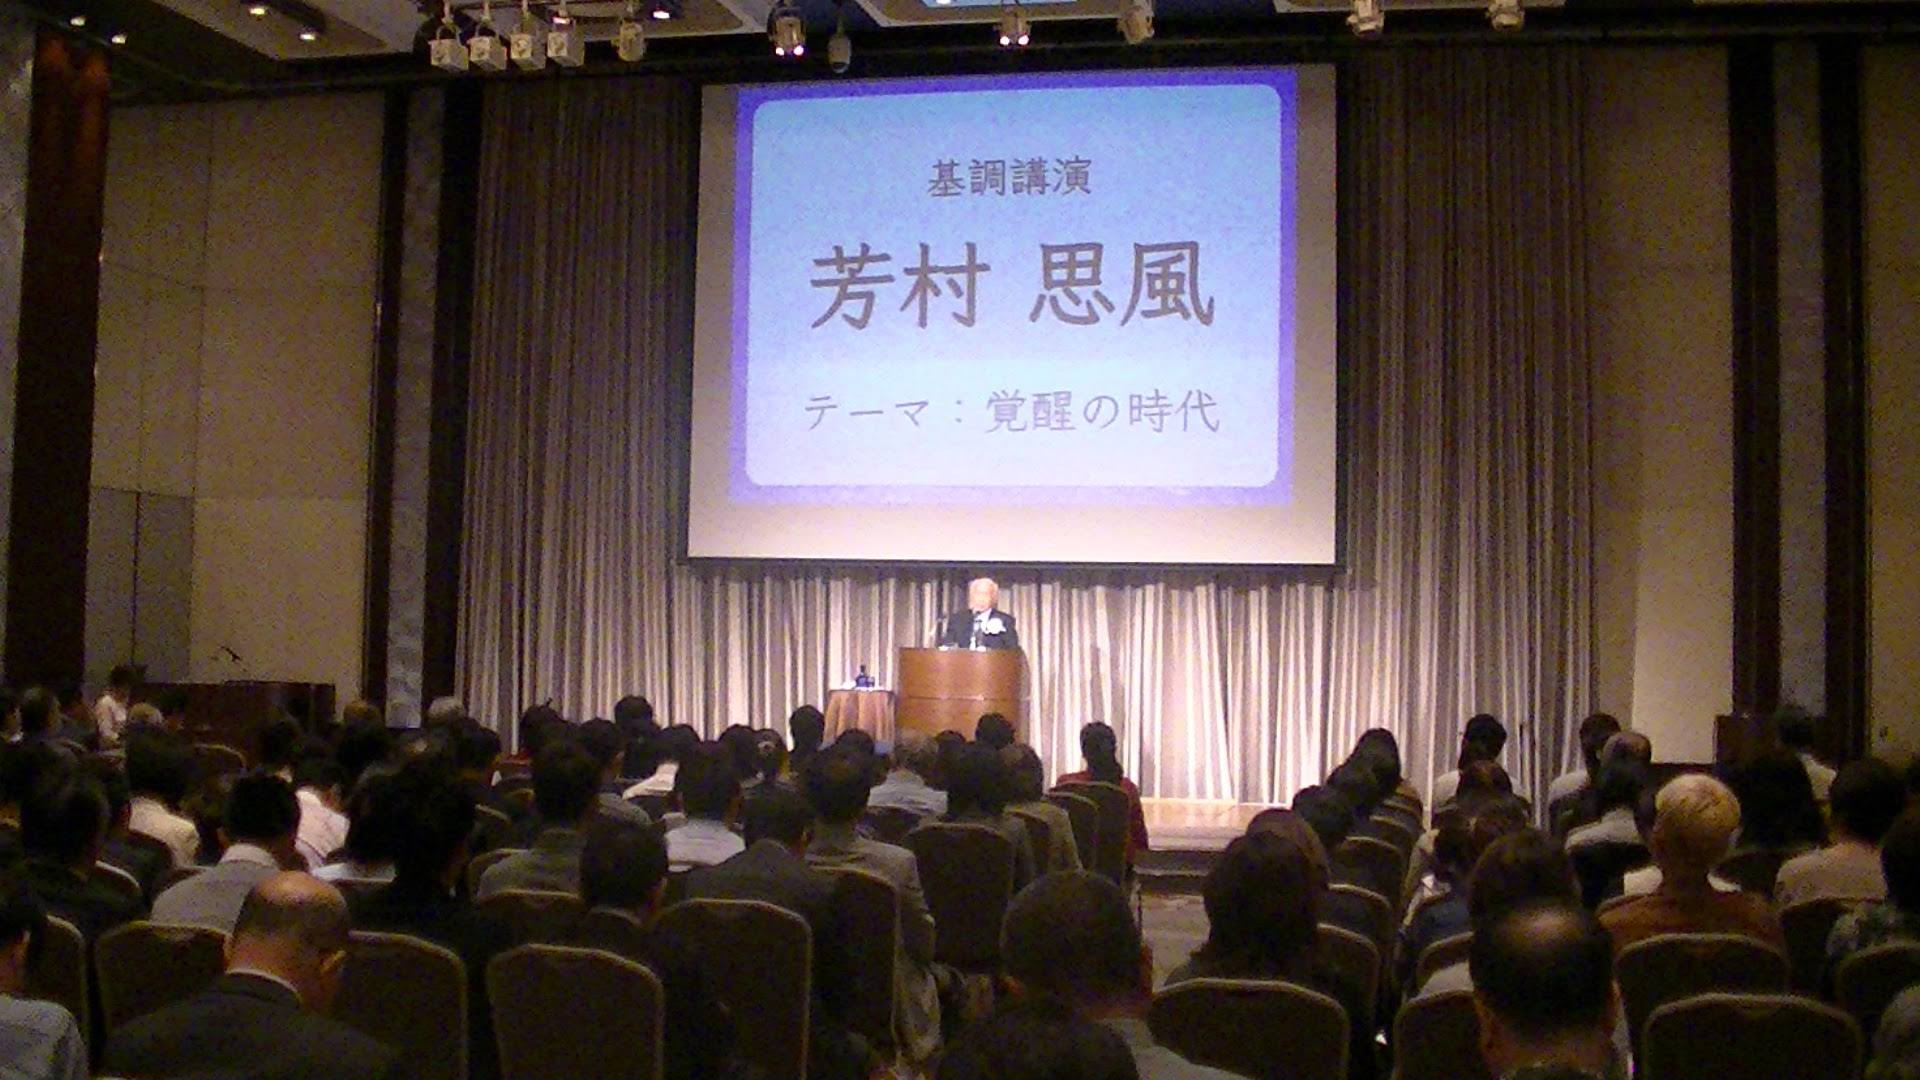 PIC 1641 1 - 思風会全国大会in広島